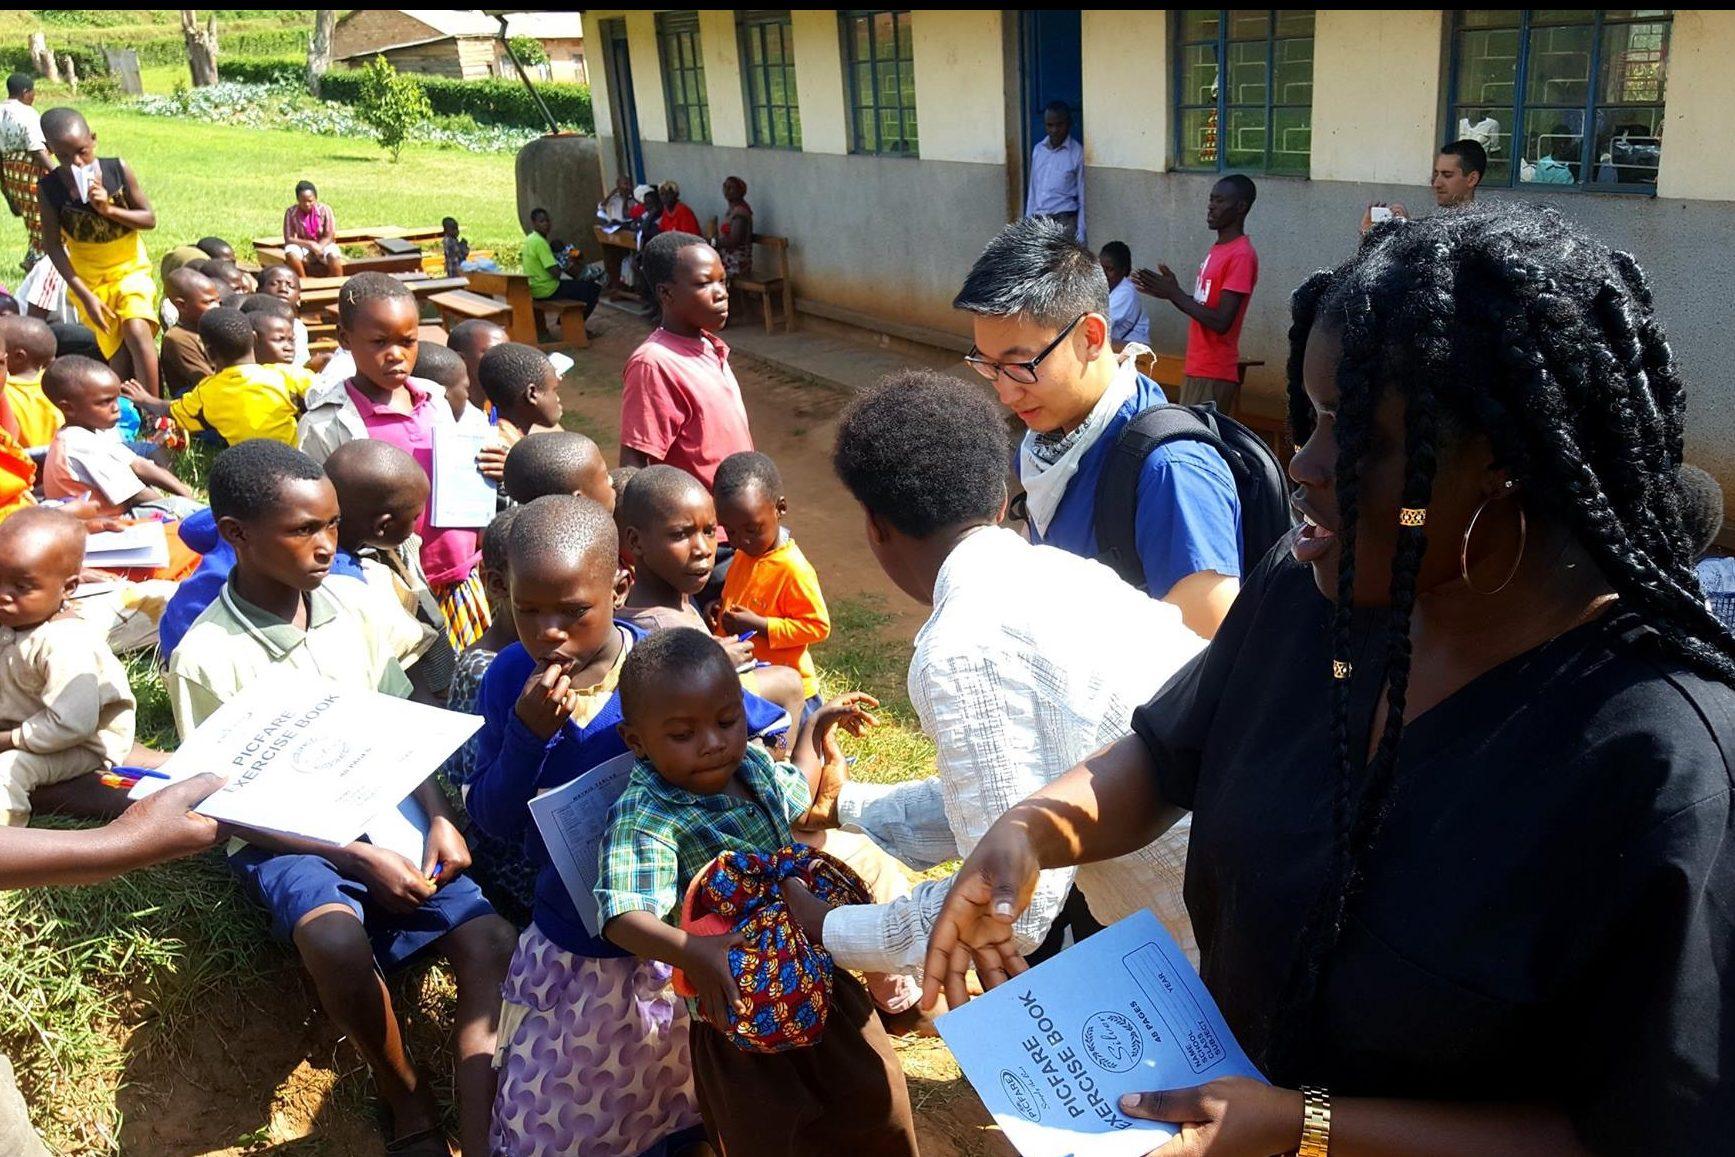 My Time in Kabale, Uganda